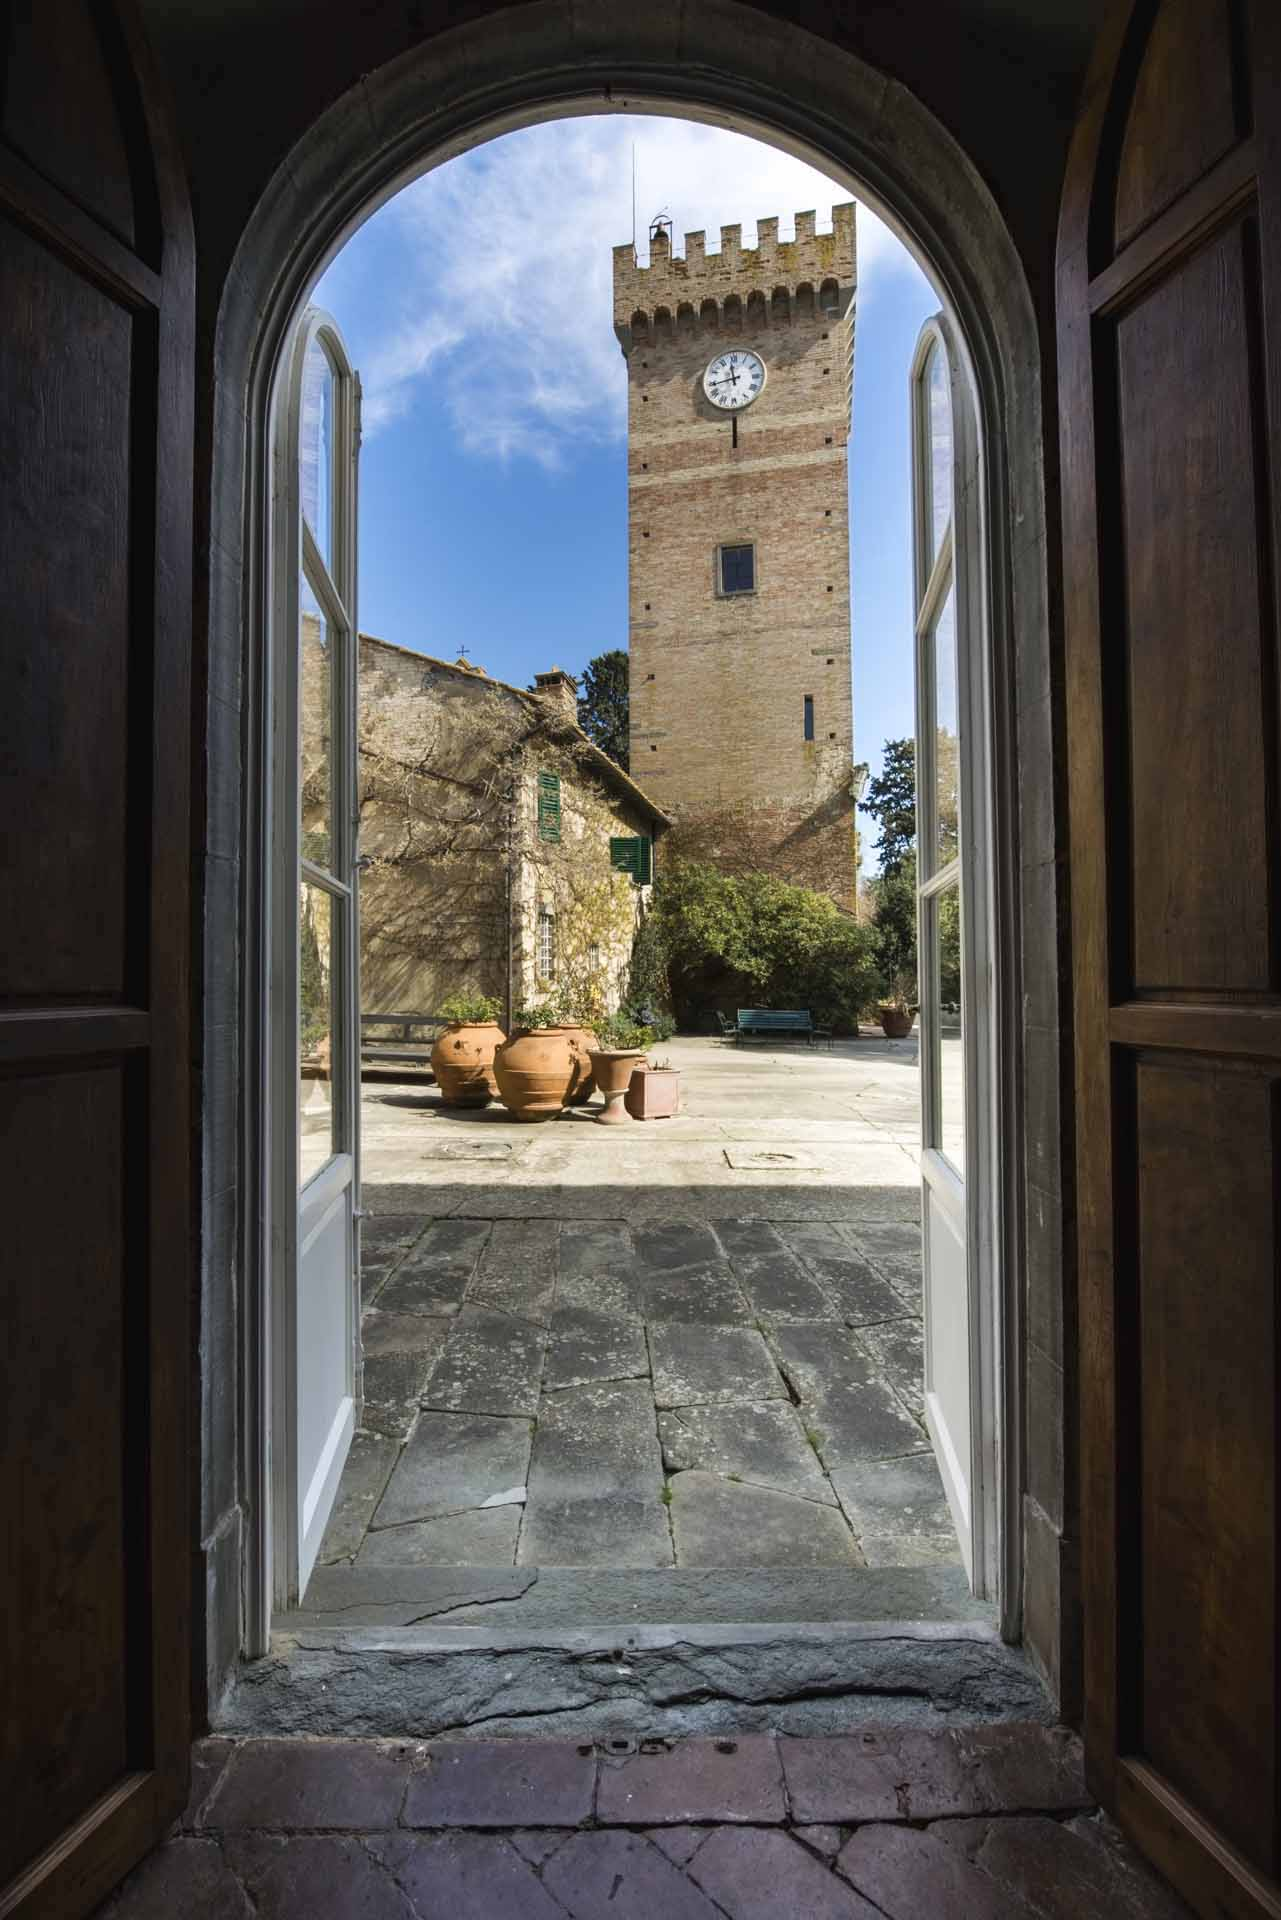 Castello Sonnino Montespertoli Firenze Caterina De Renzis 00003